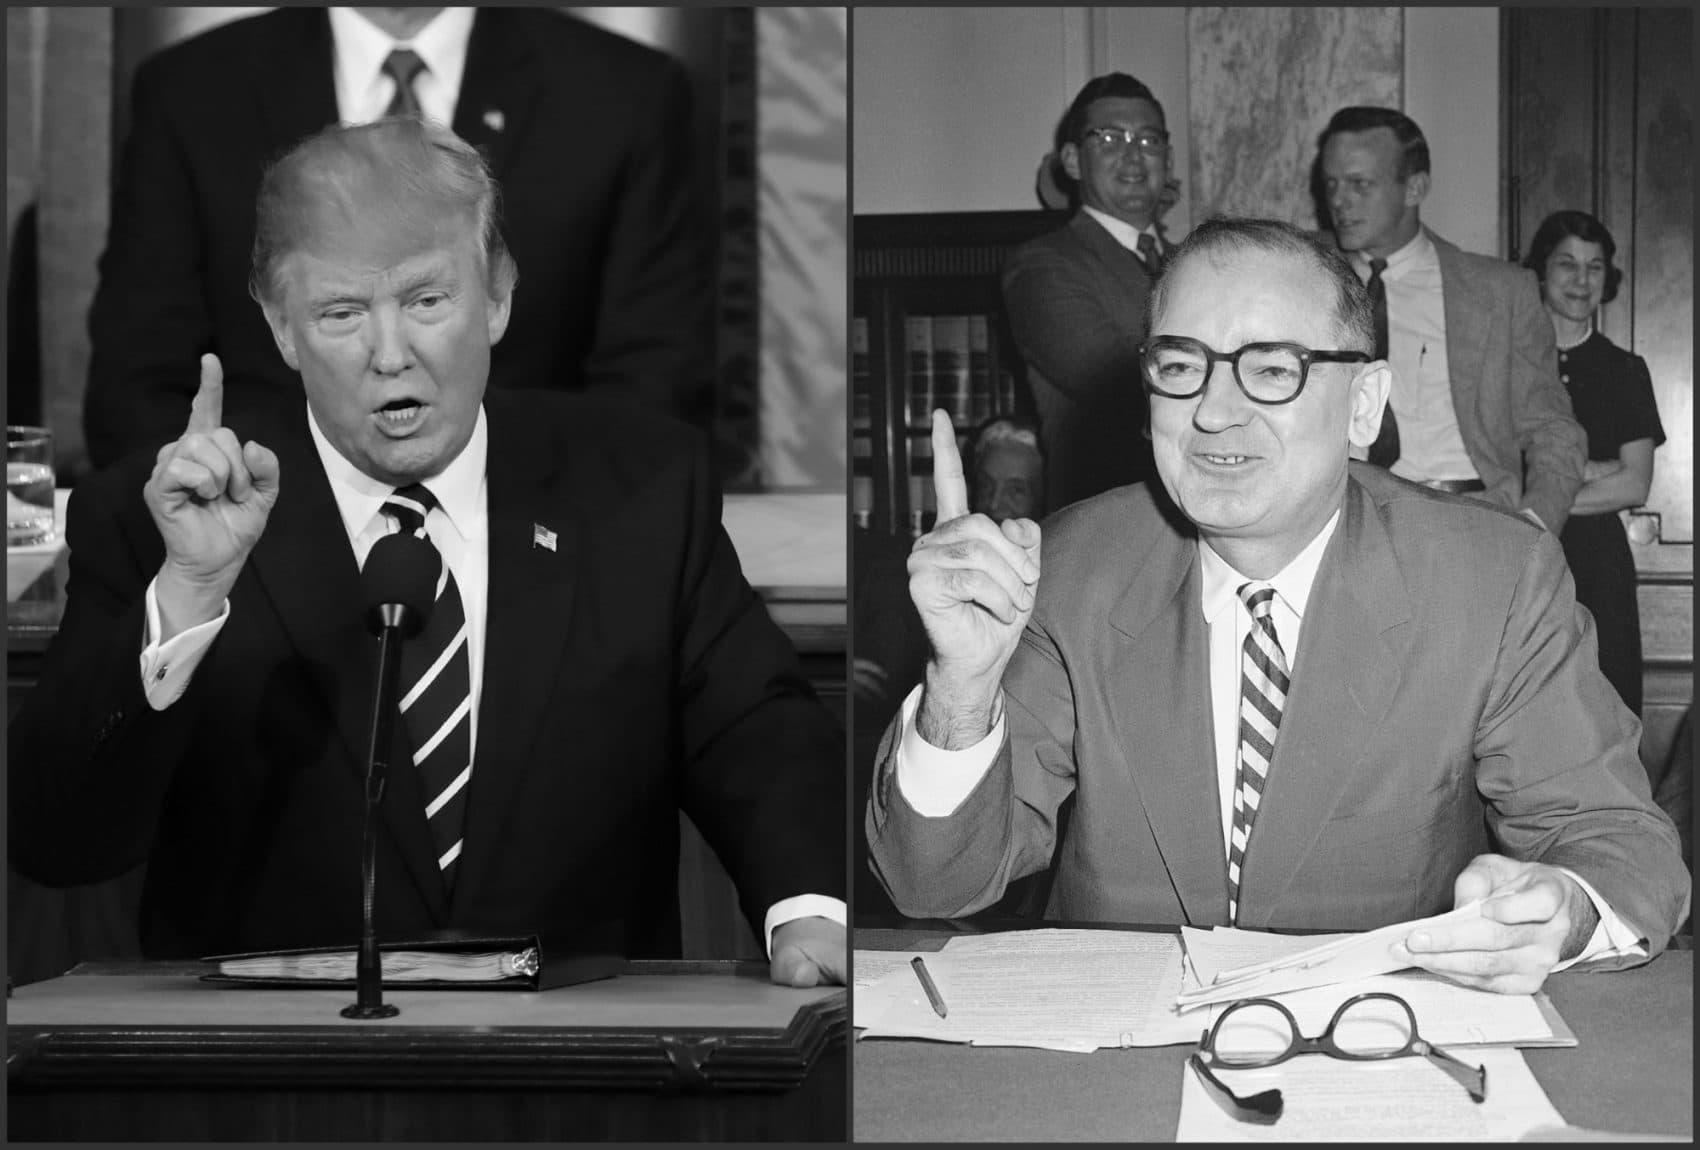 Left: President Donald Trump addresses a joint session of Congress on Capitol Hill in Washington, Tuesday, Feb. 28, 2017. (Pablo Martinez Monsivais/AP) Right: Sen. Joseph McCarthy (R-Wisc.), in Washington on Feb. 26, 1957. (John Rous/AP)